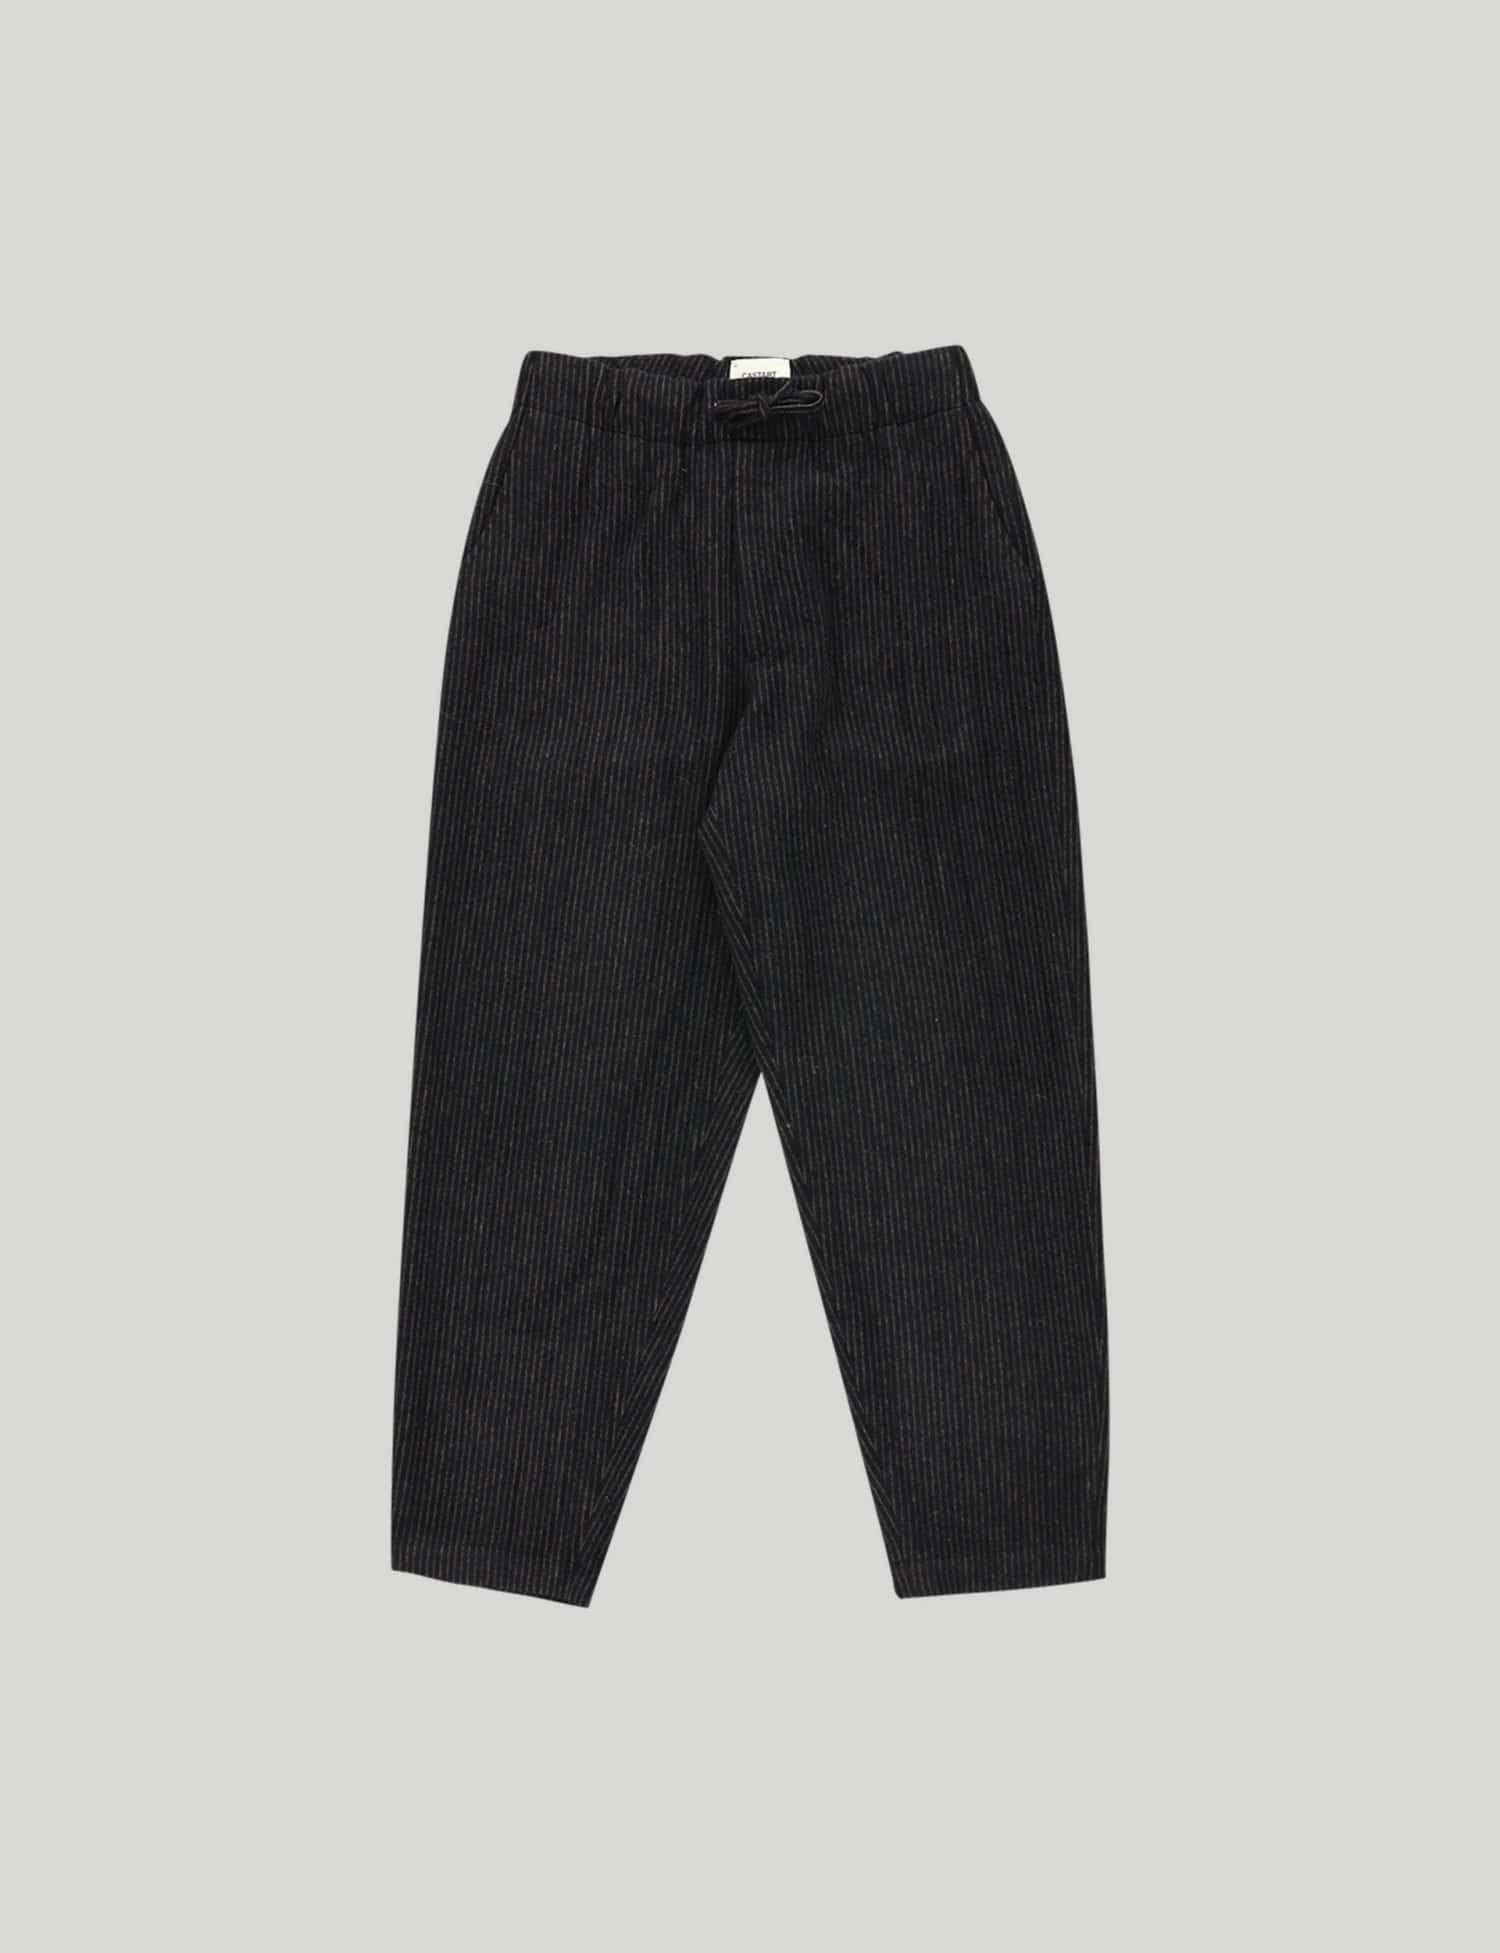 Castart - Blue Mickey Pants - Navy